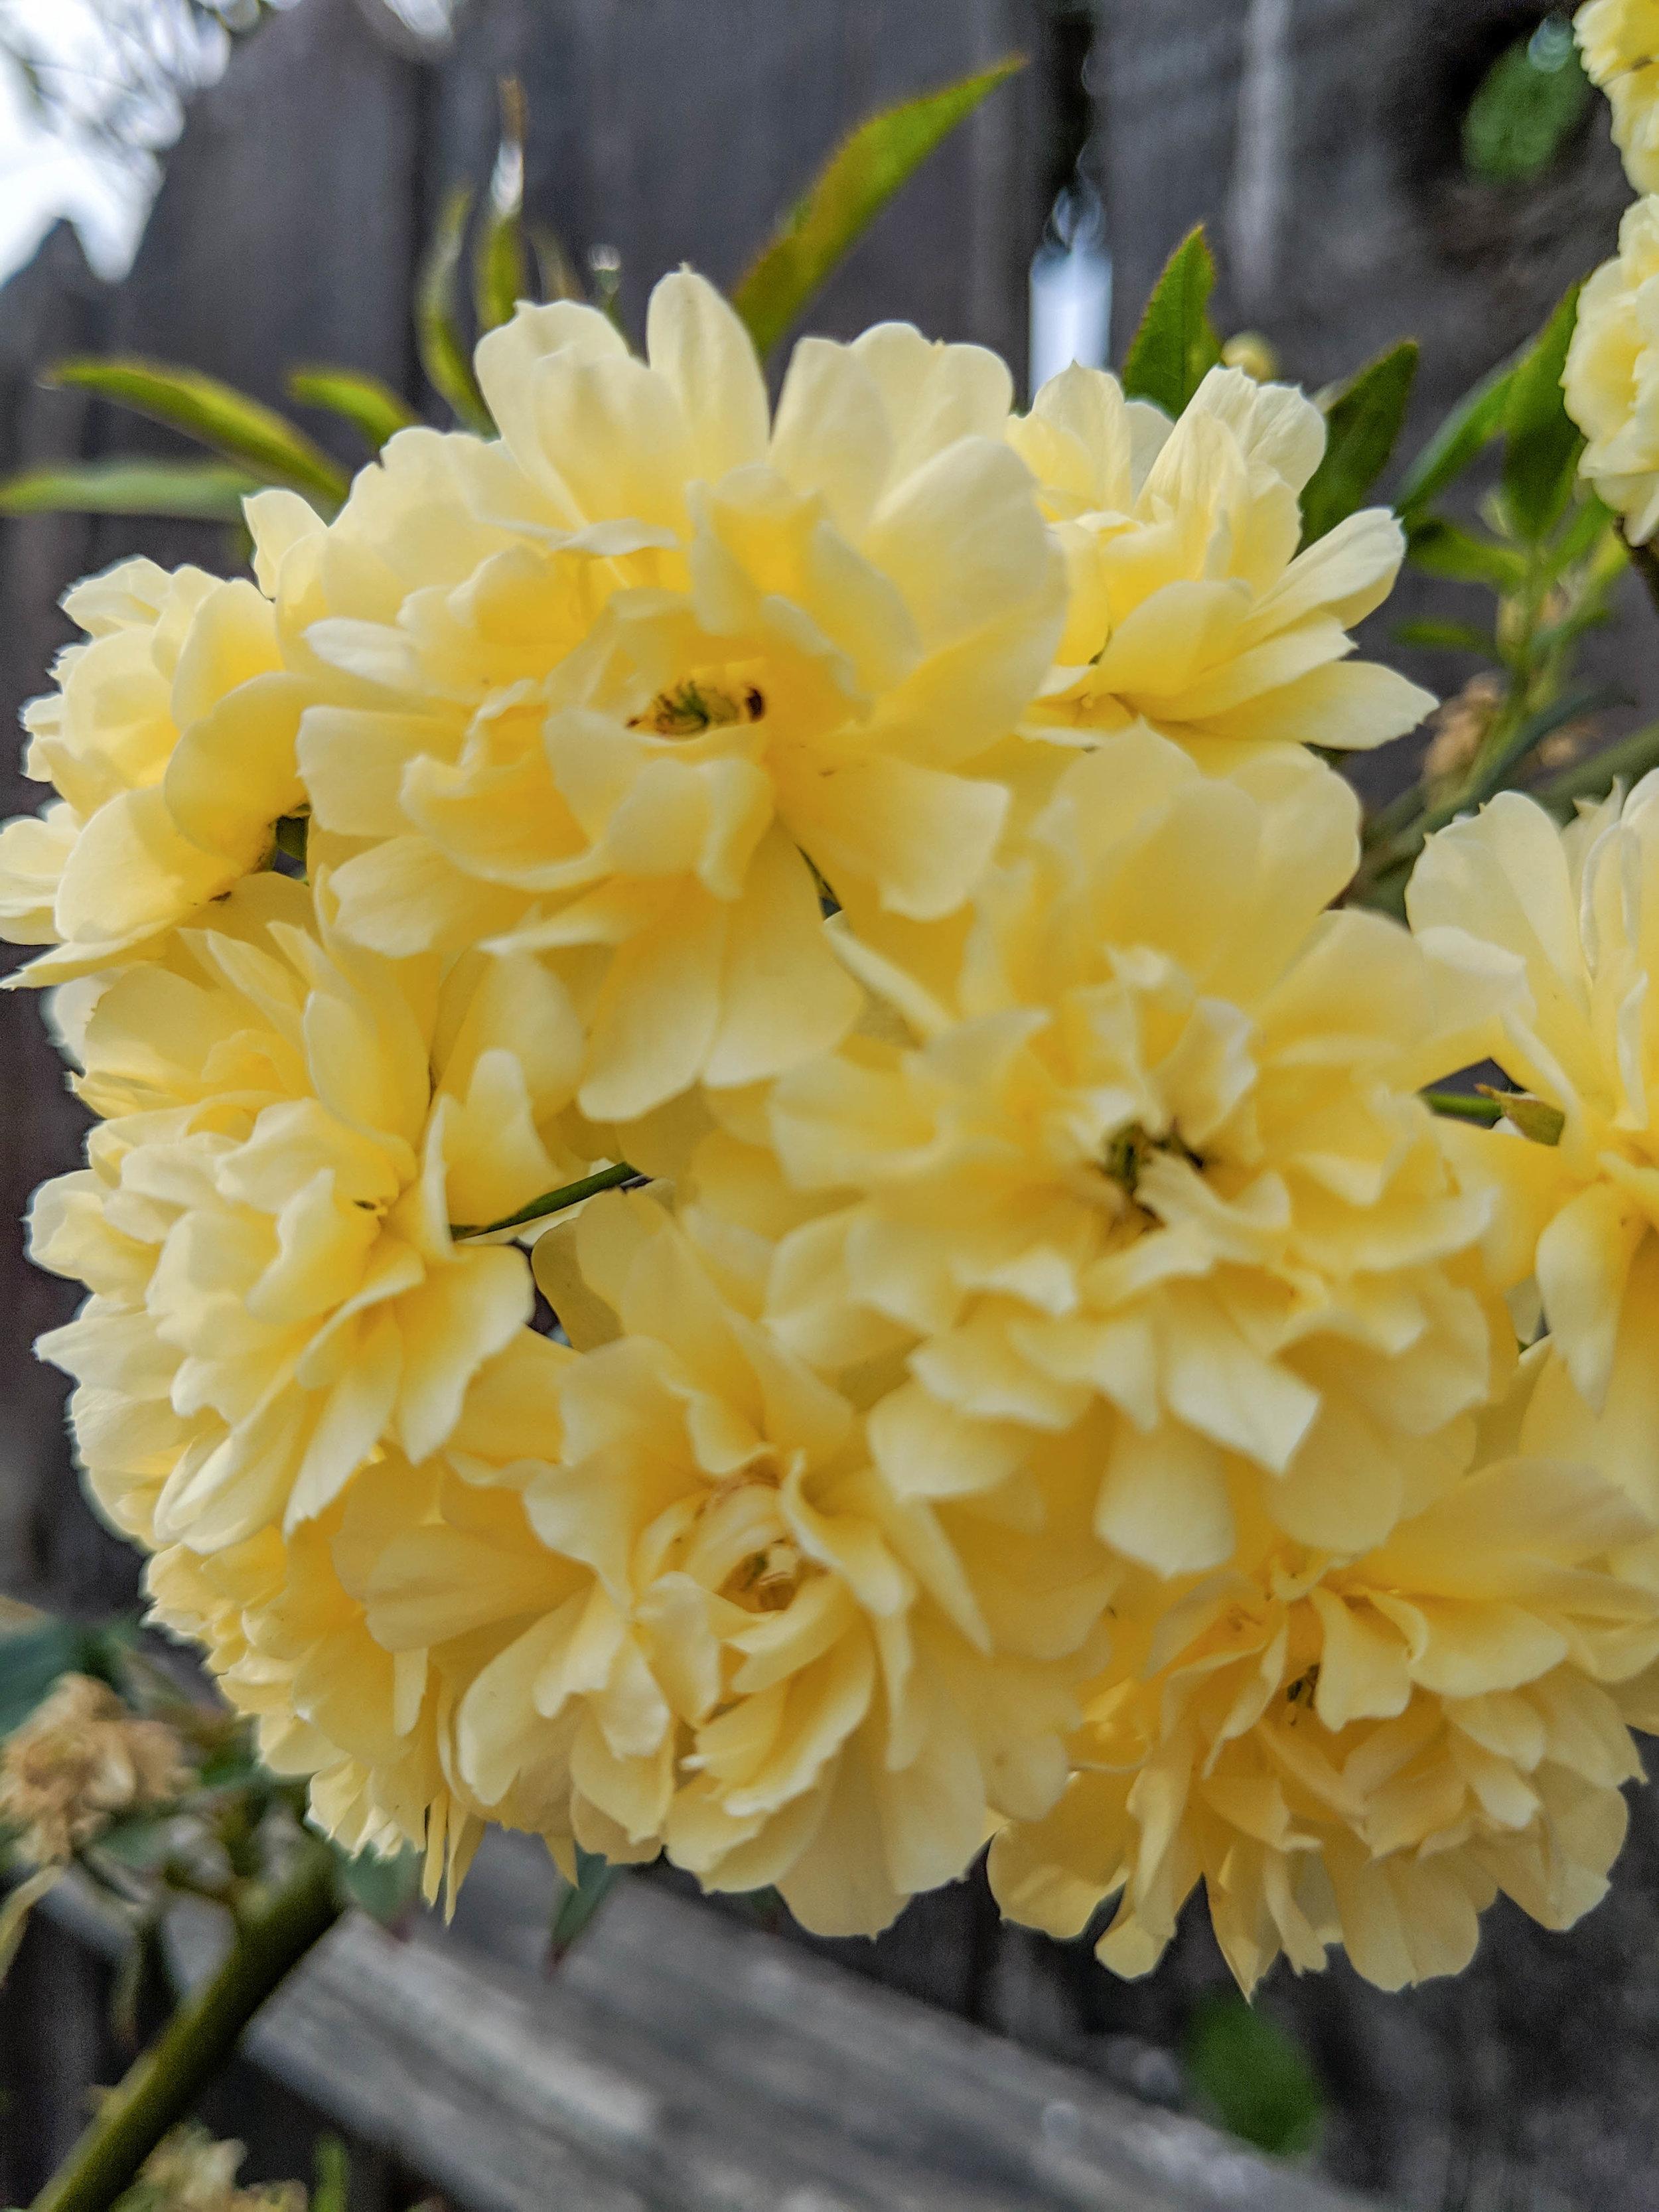 bri rinehart; photography; photography series; flowers; spring; nature